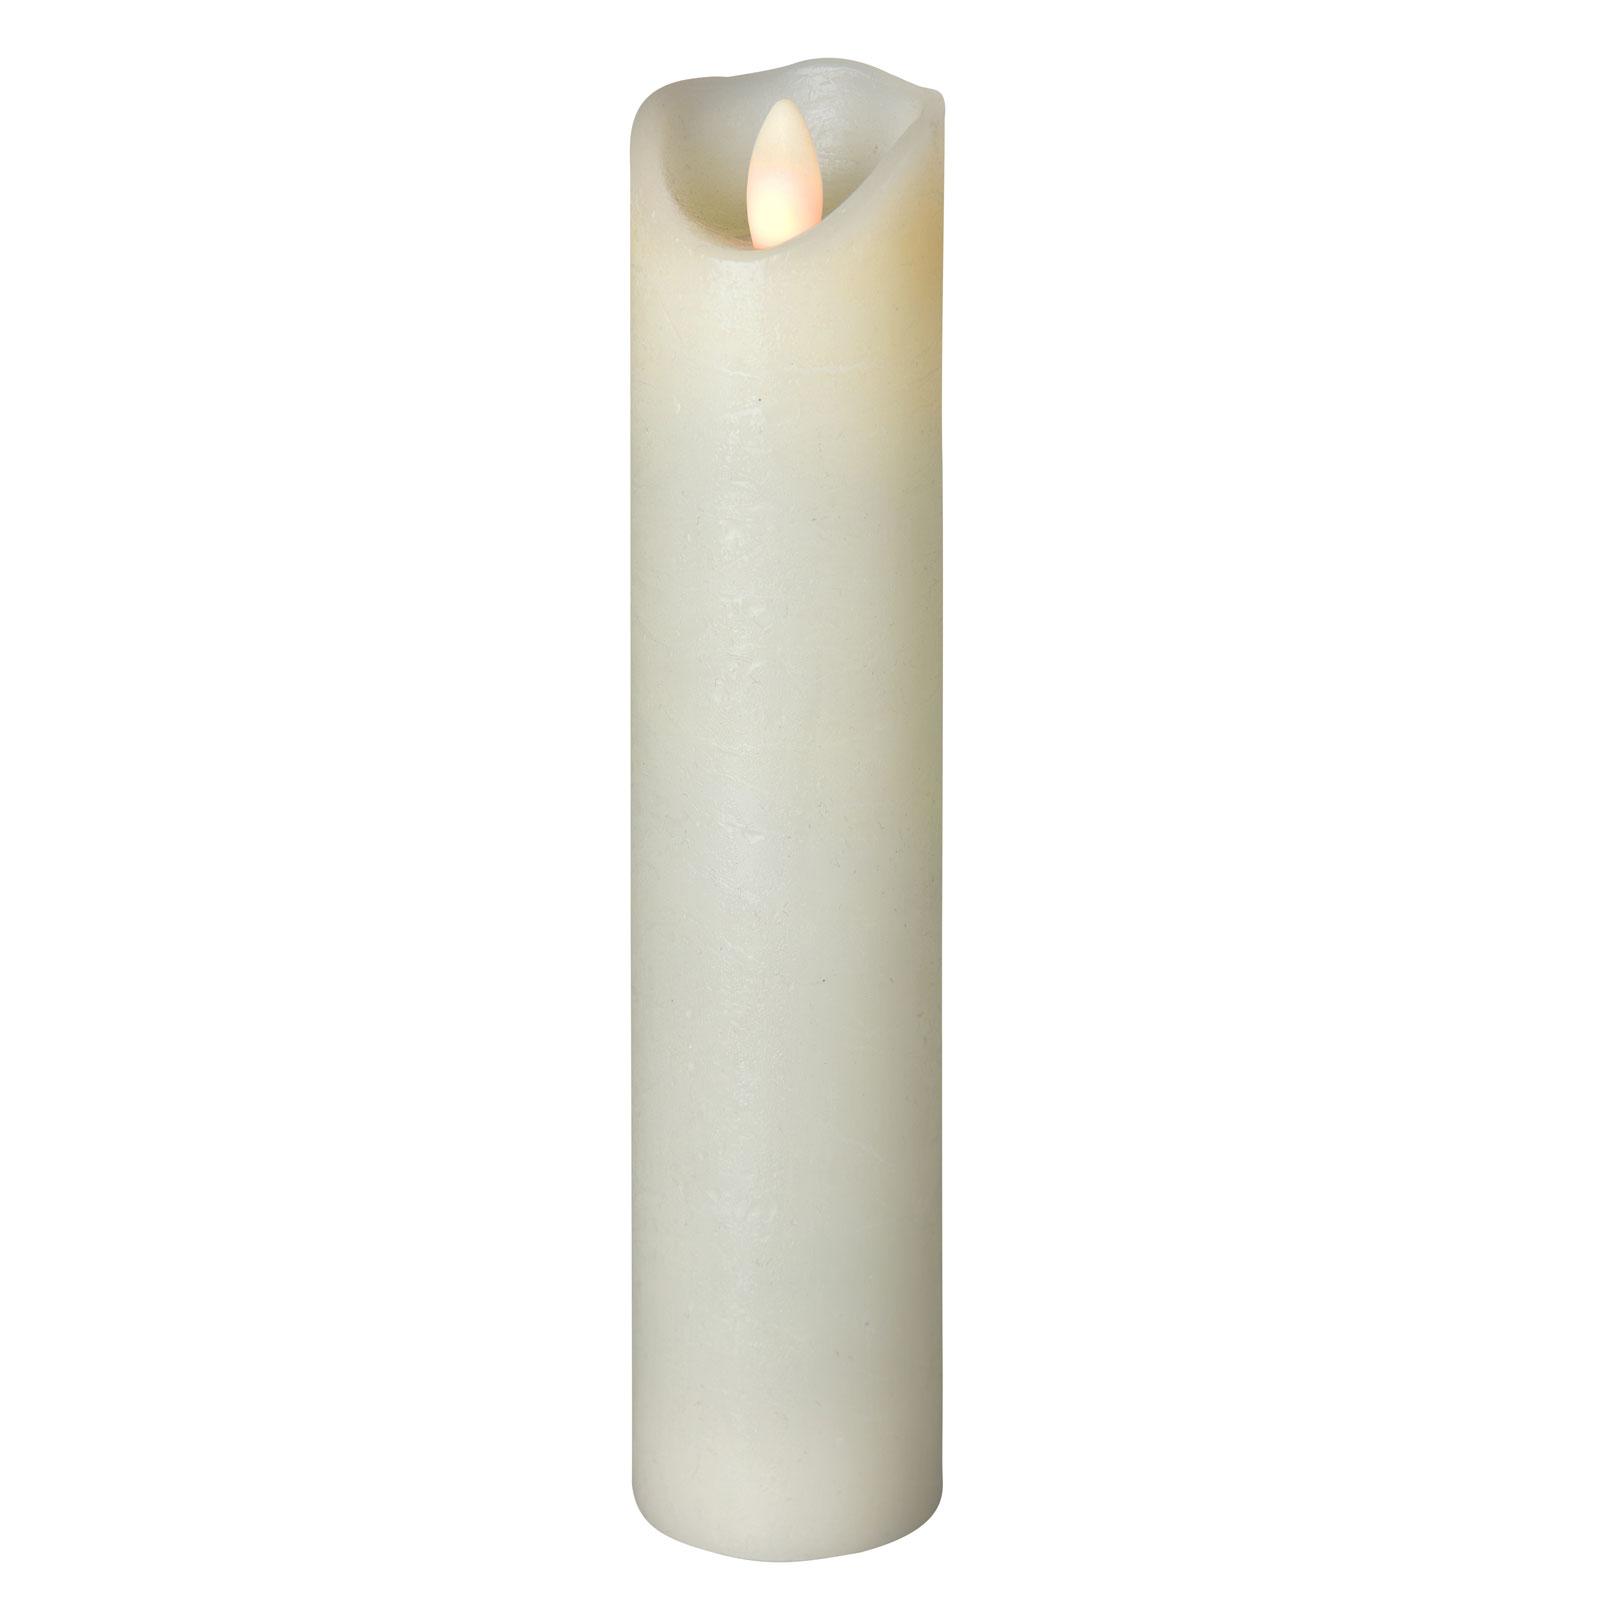 LED-Kerze Shine, Ø 5 cm, elfenbein, Höhe 22,5 cm